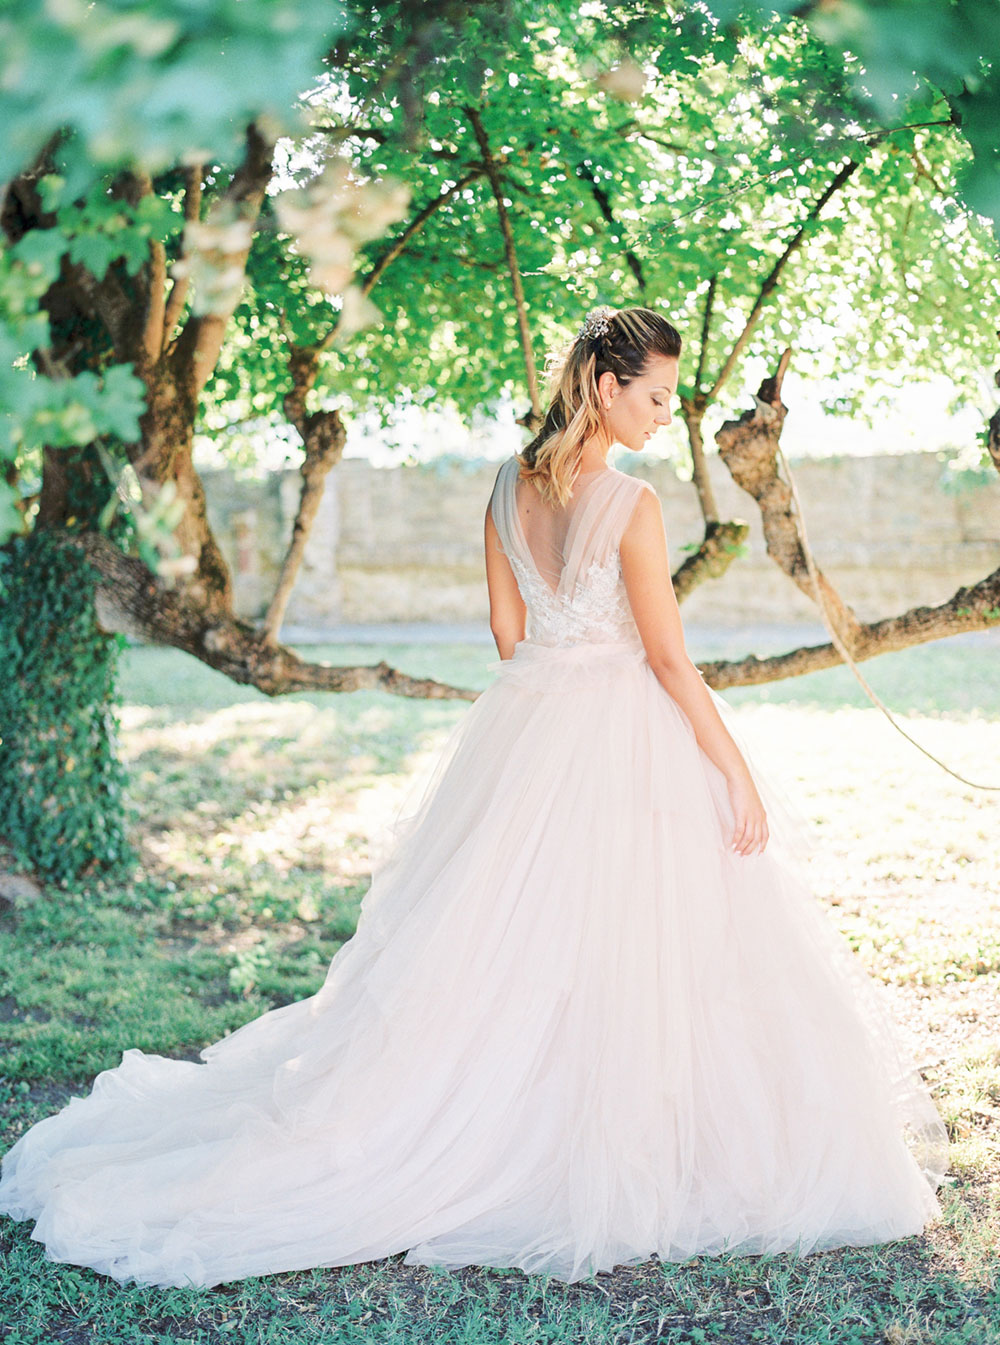 Linari-Tuscany-Elopement-Courtney-Michaela-279